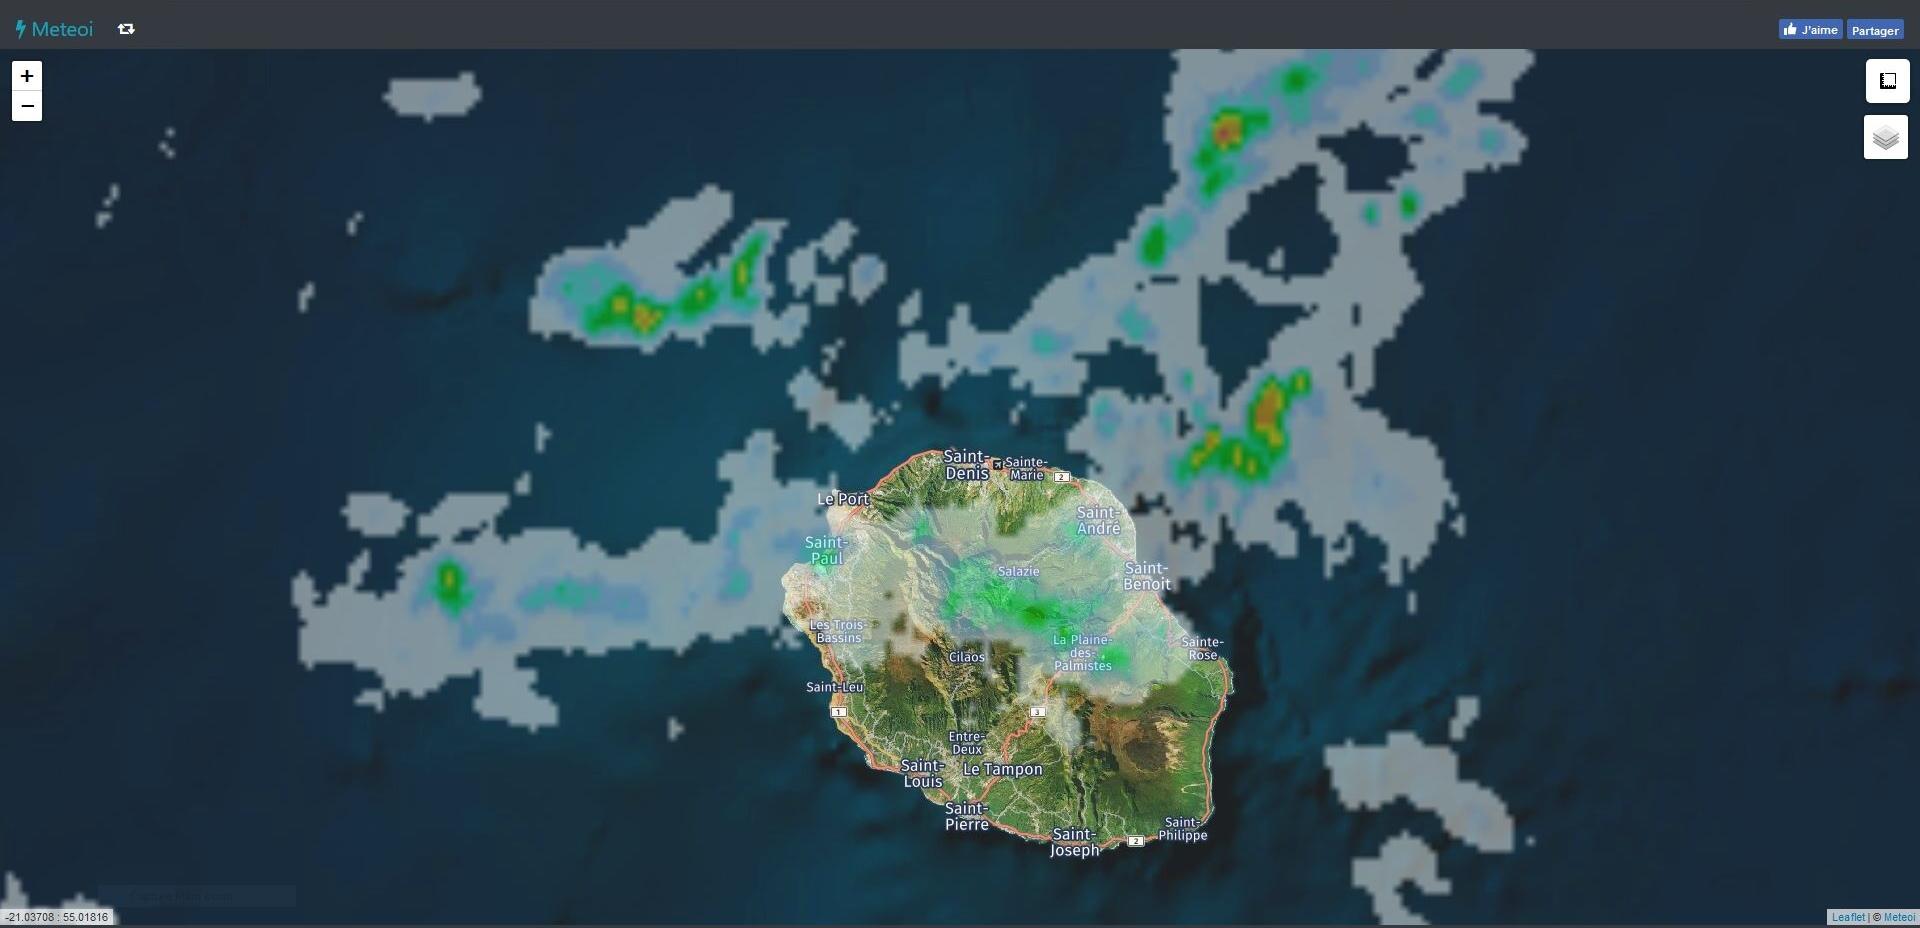 Image radar de 20h40. https://www.meteoi.re/